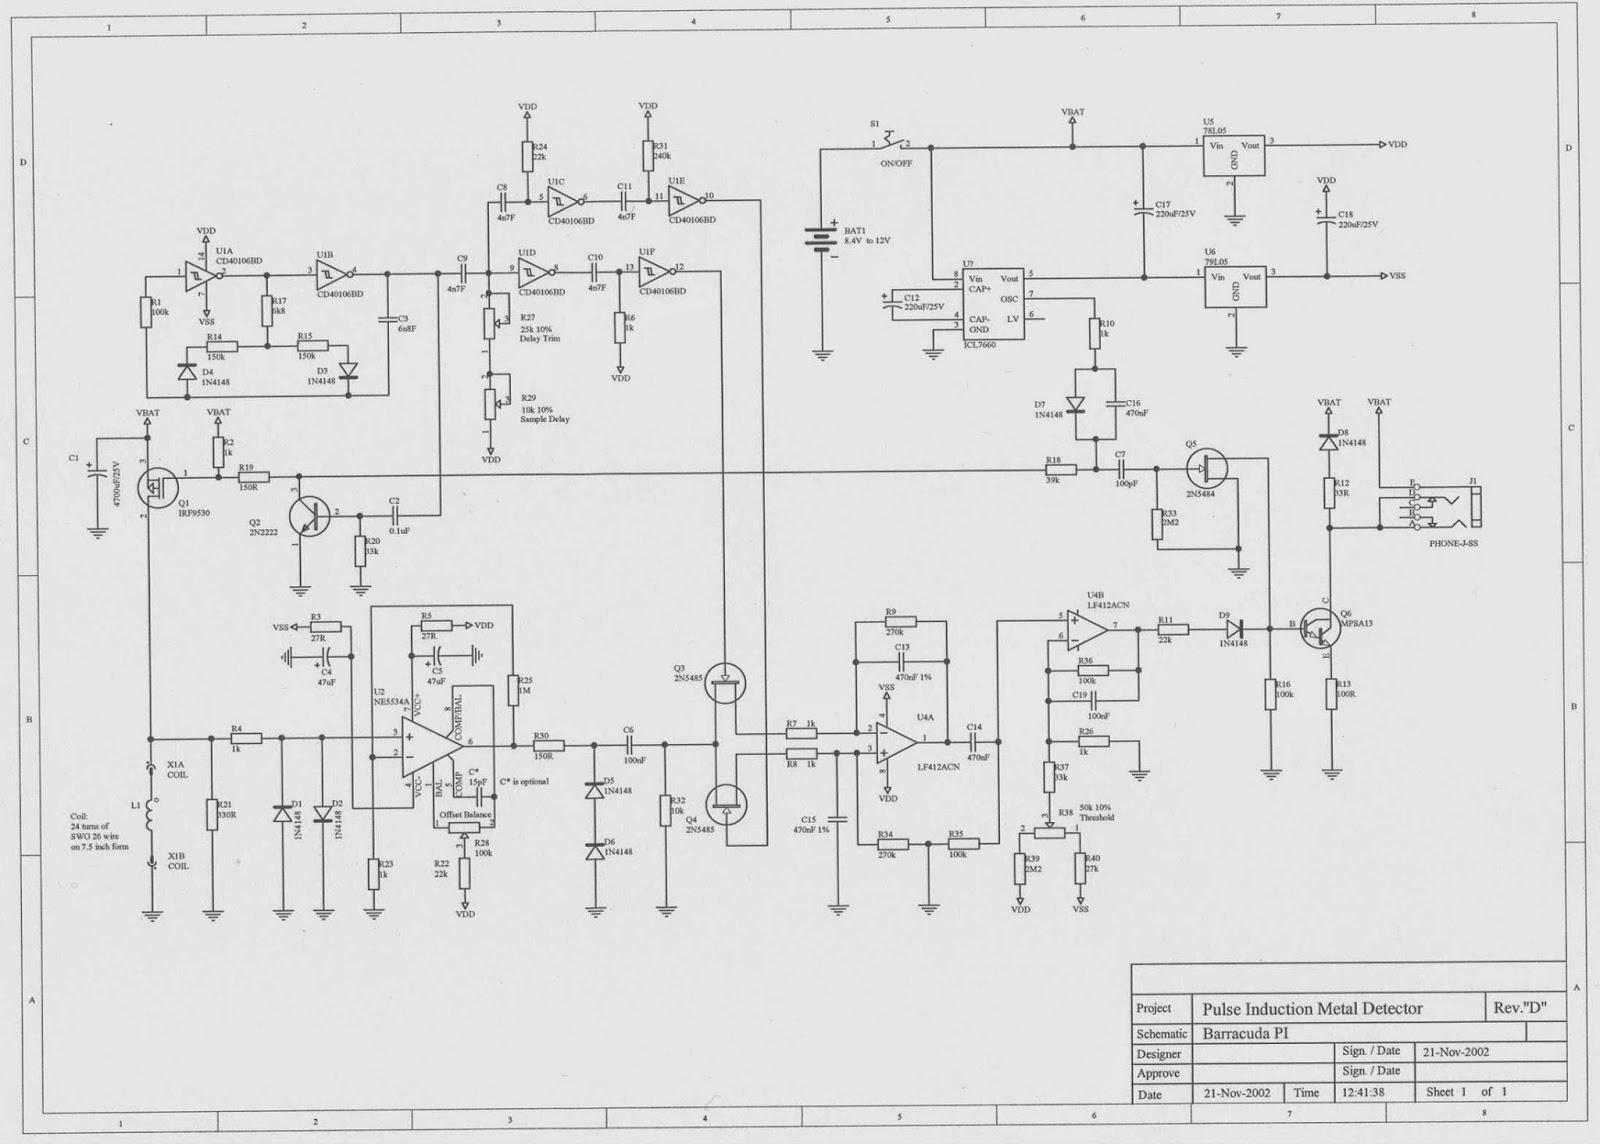 pulse induction metal detector circuit